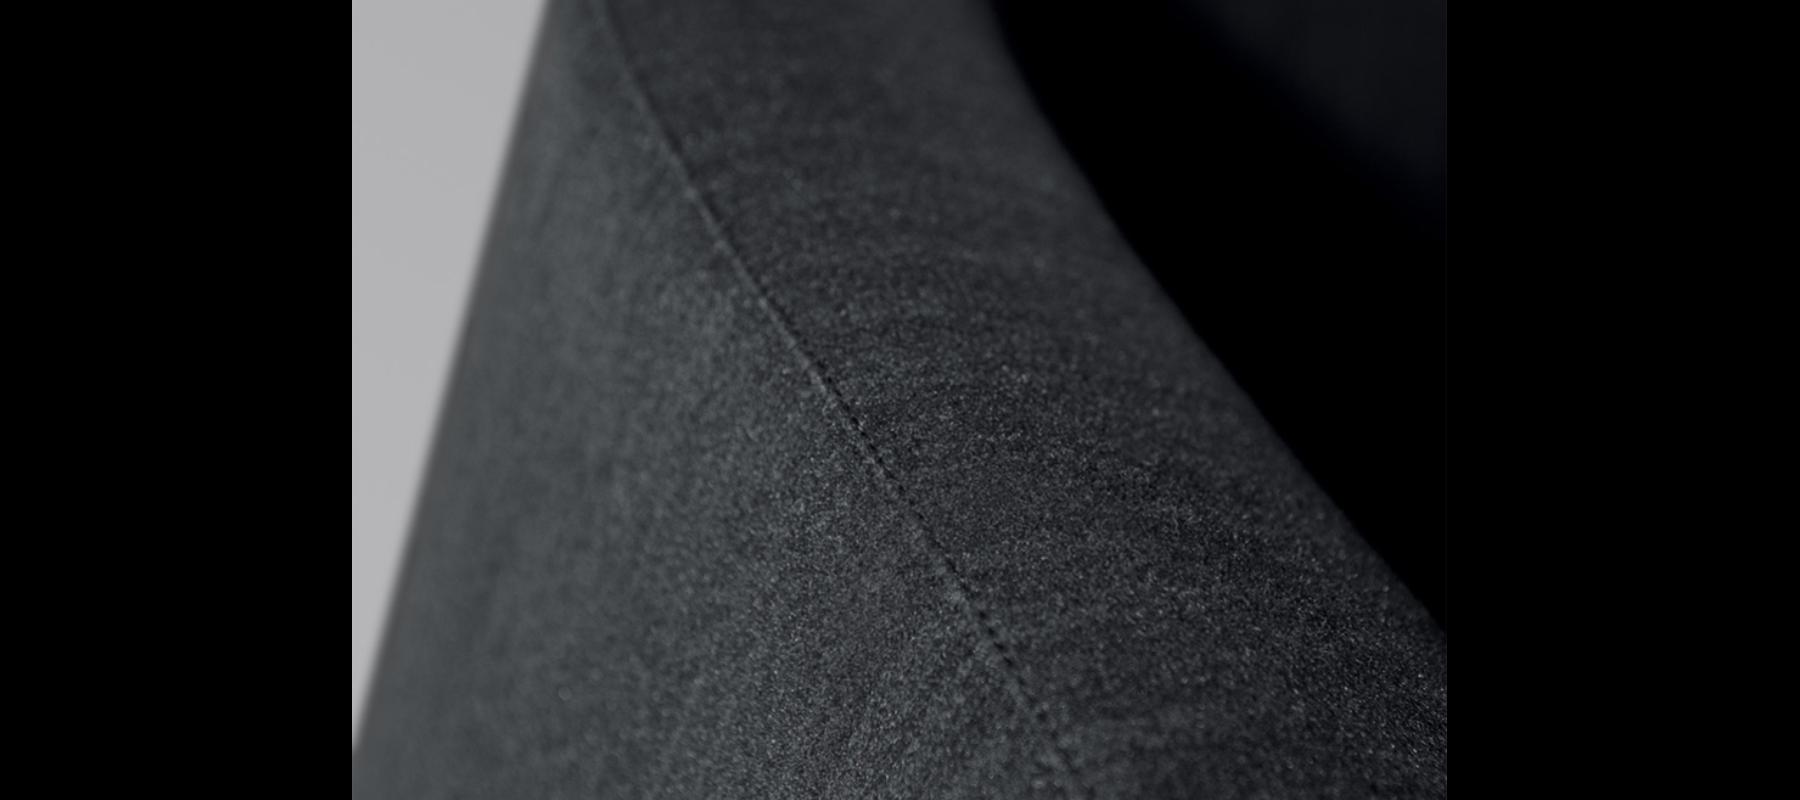 siedziska noble detale - 02